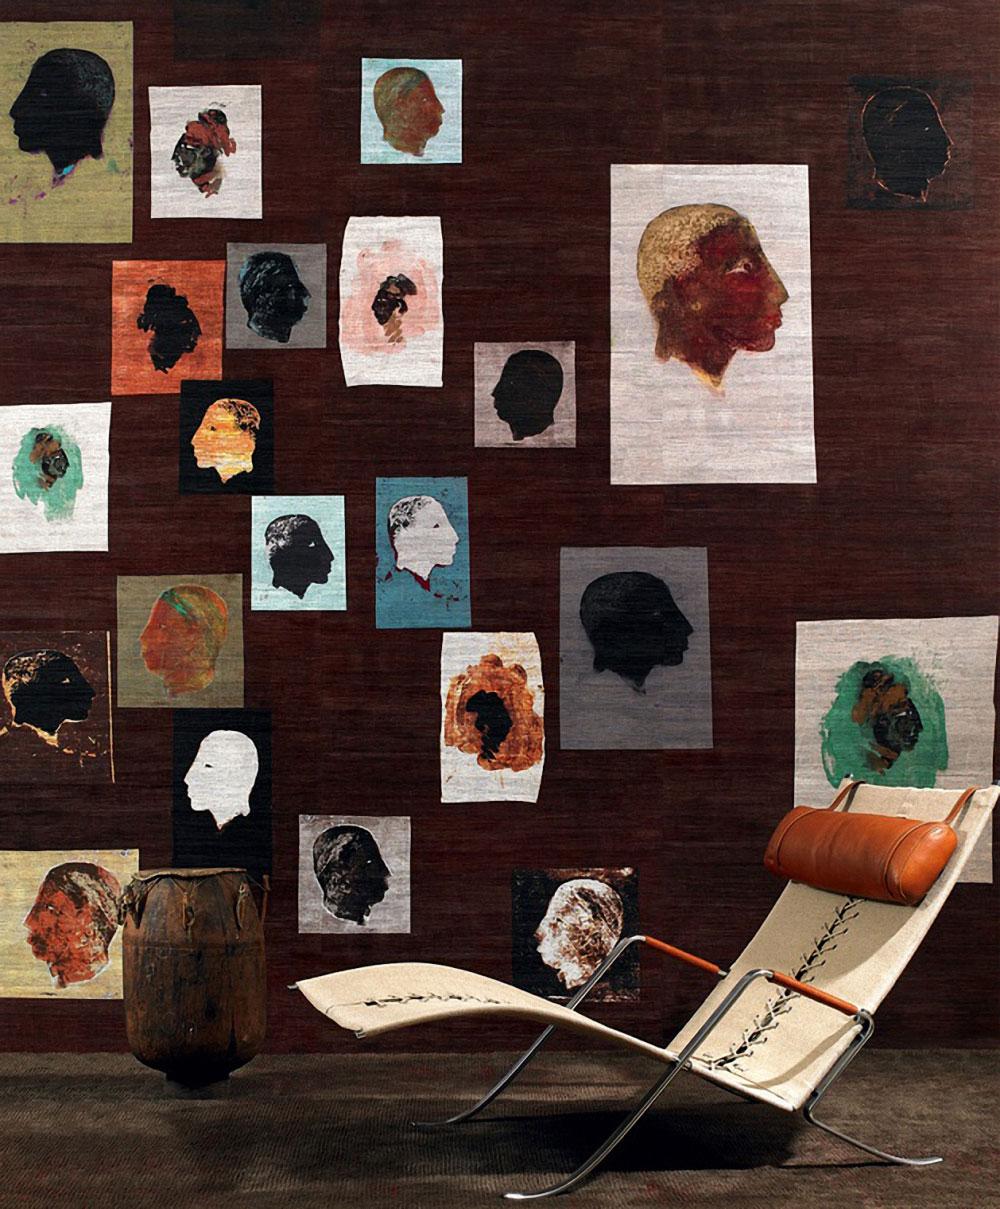 jestcafe.com--panorama wallpaper